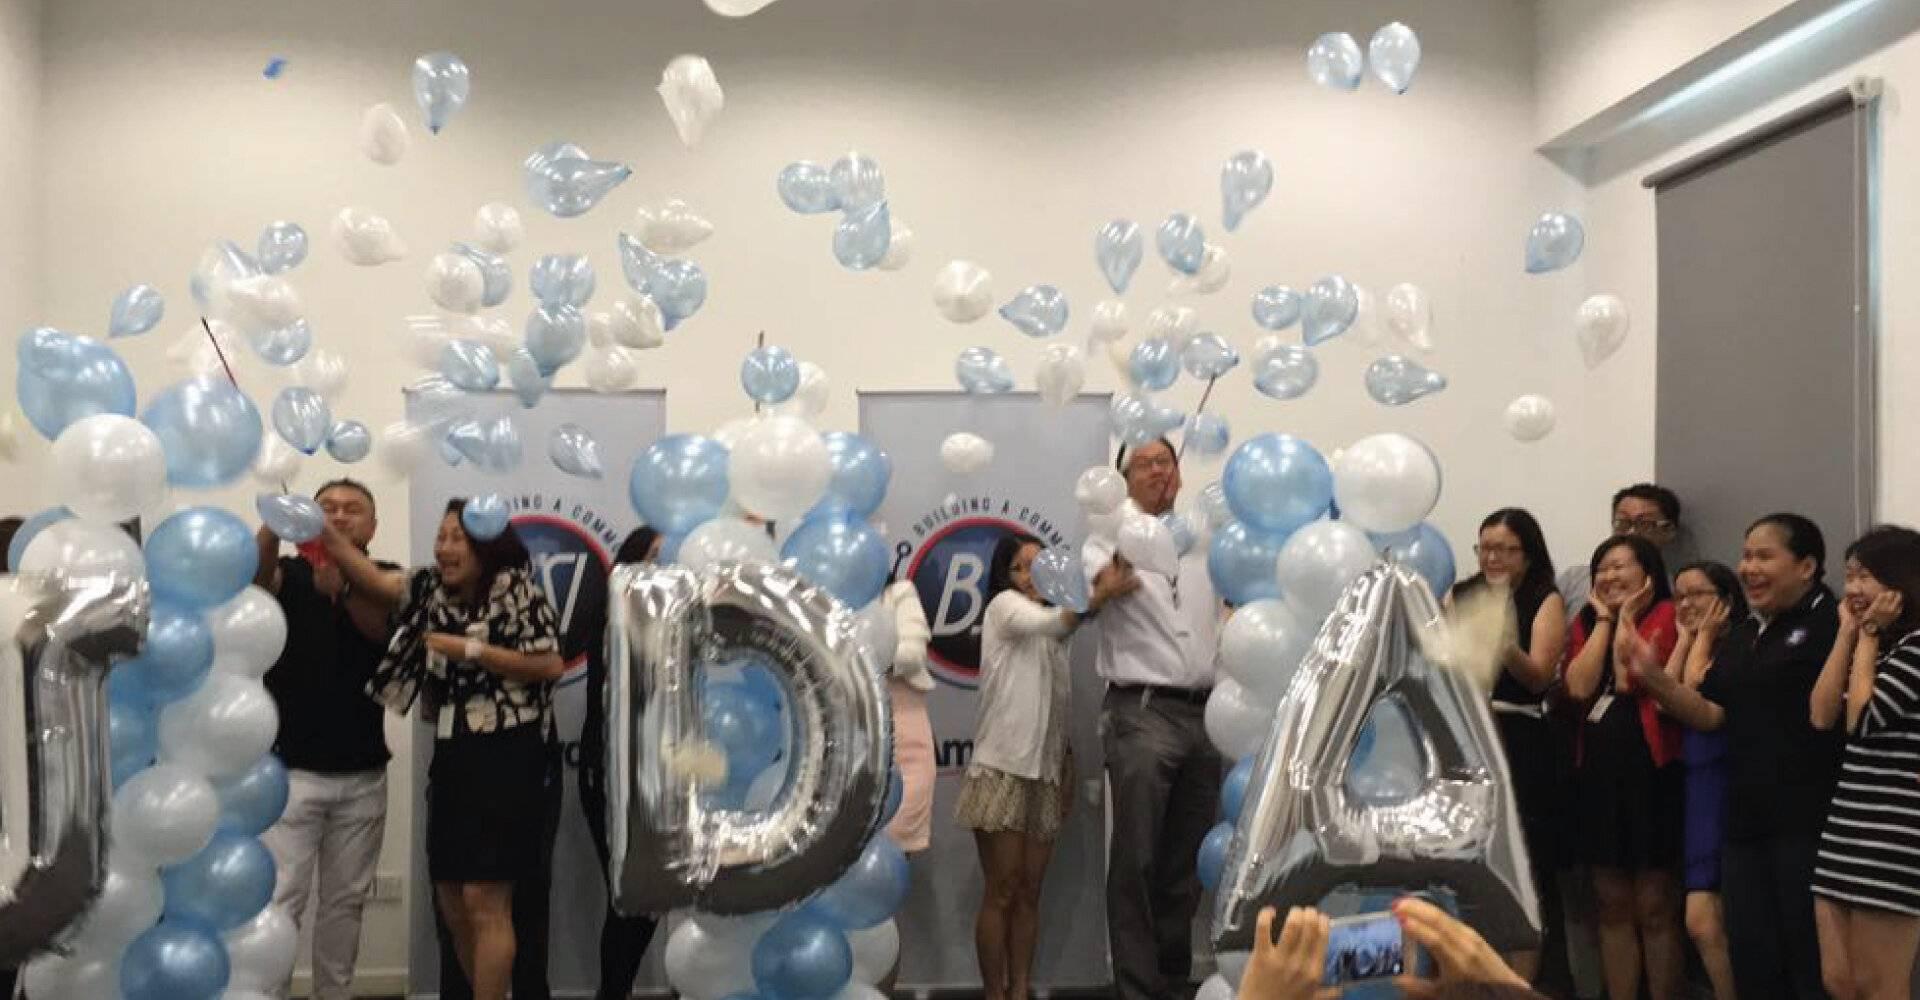 Amway Balloon Explode